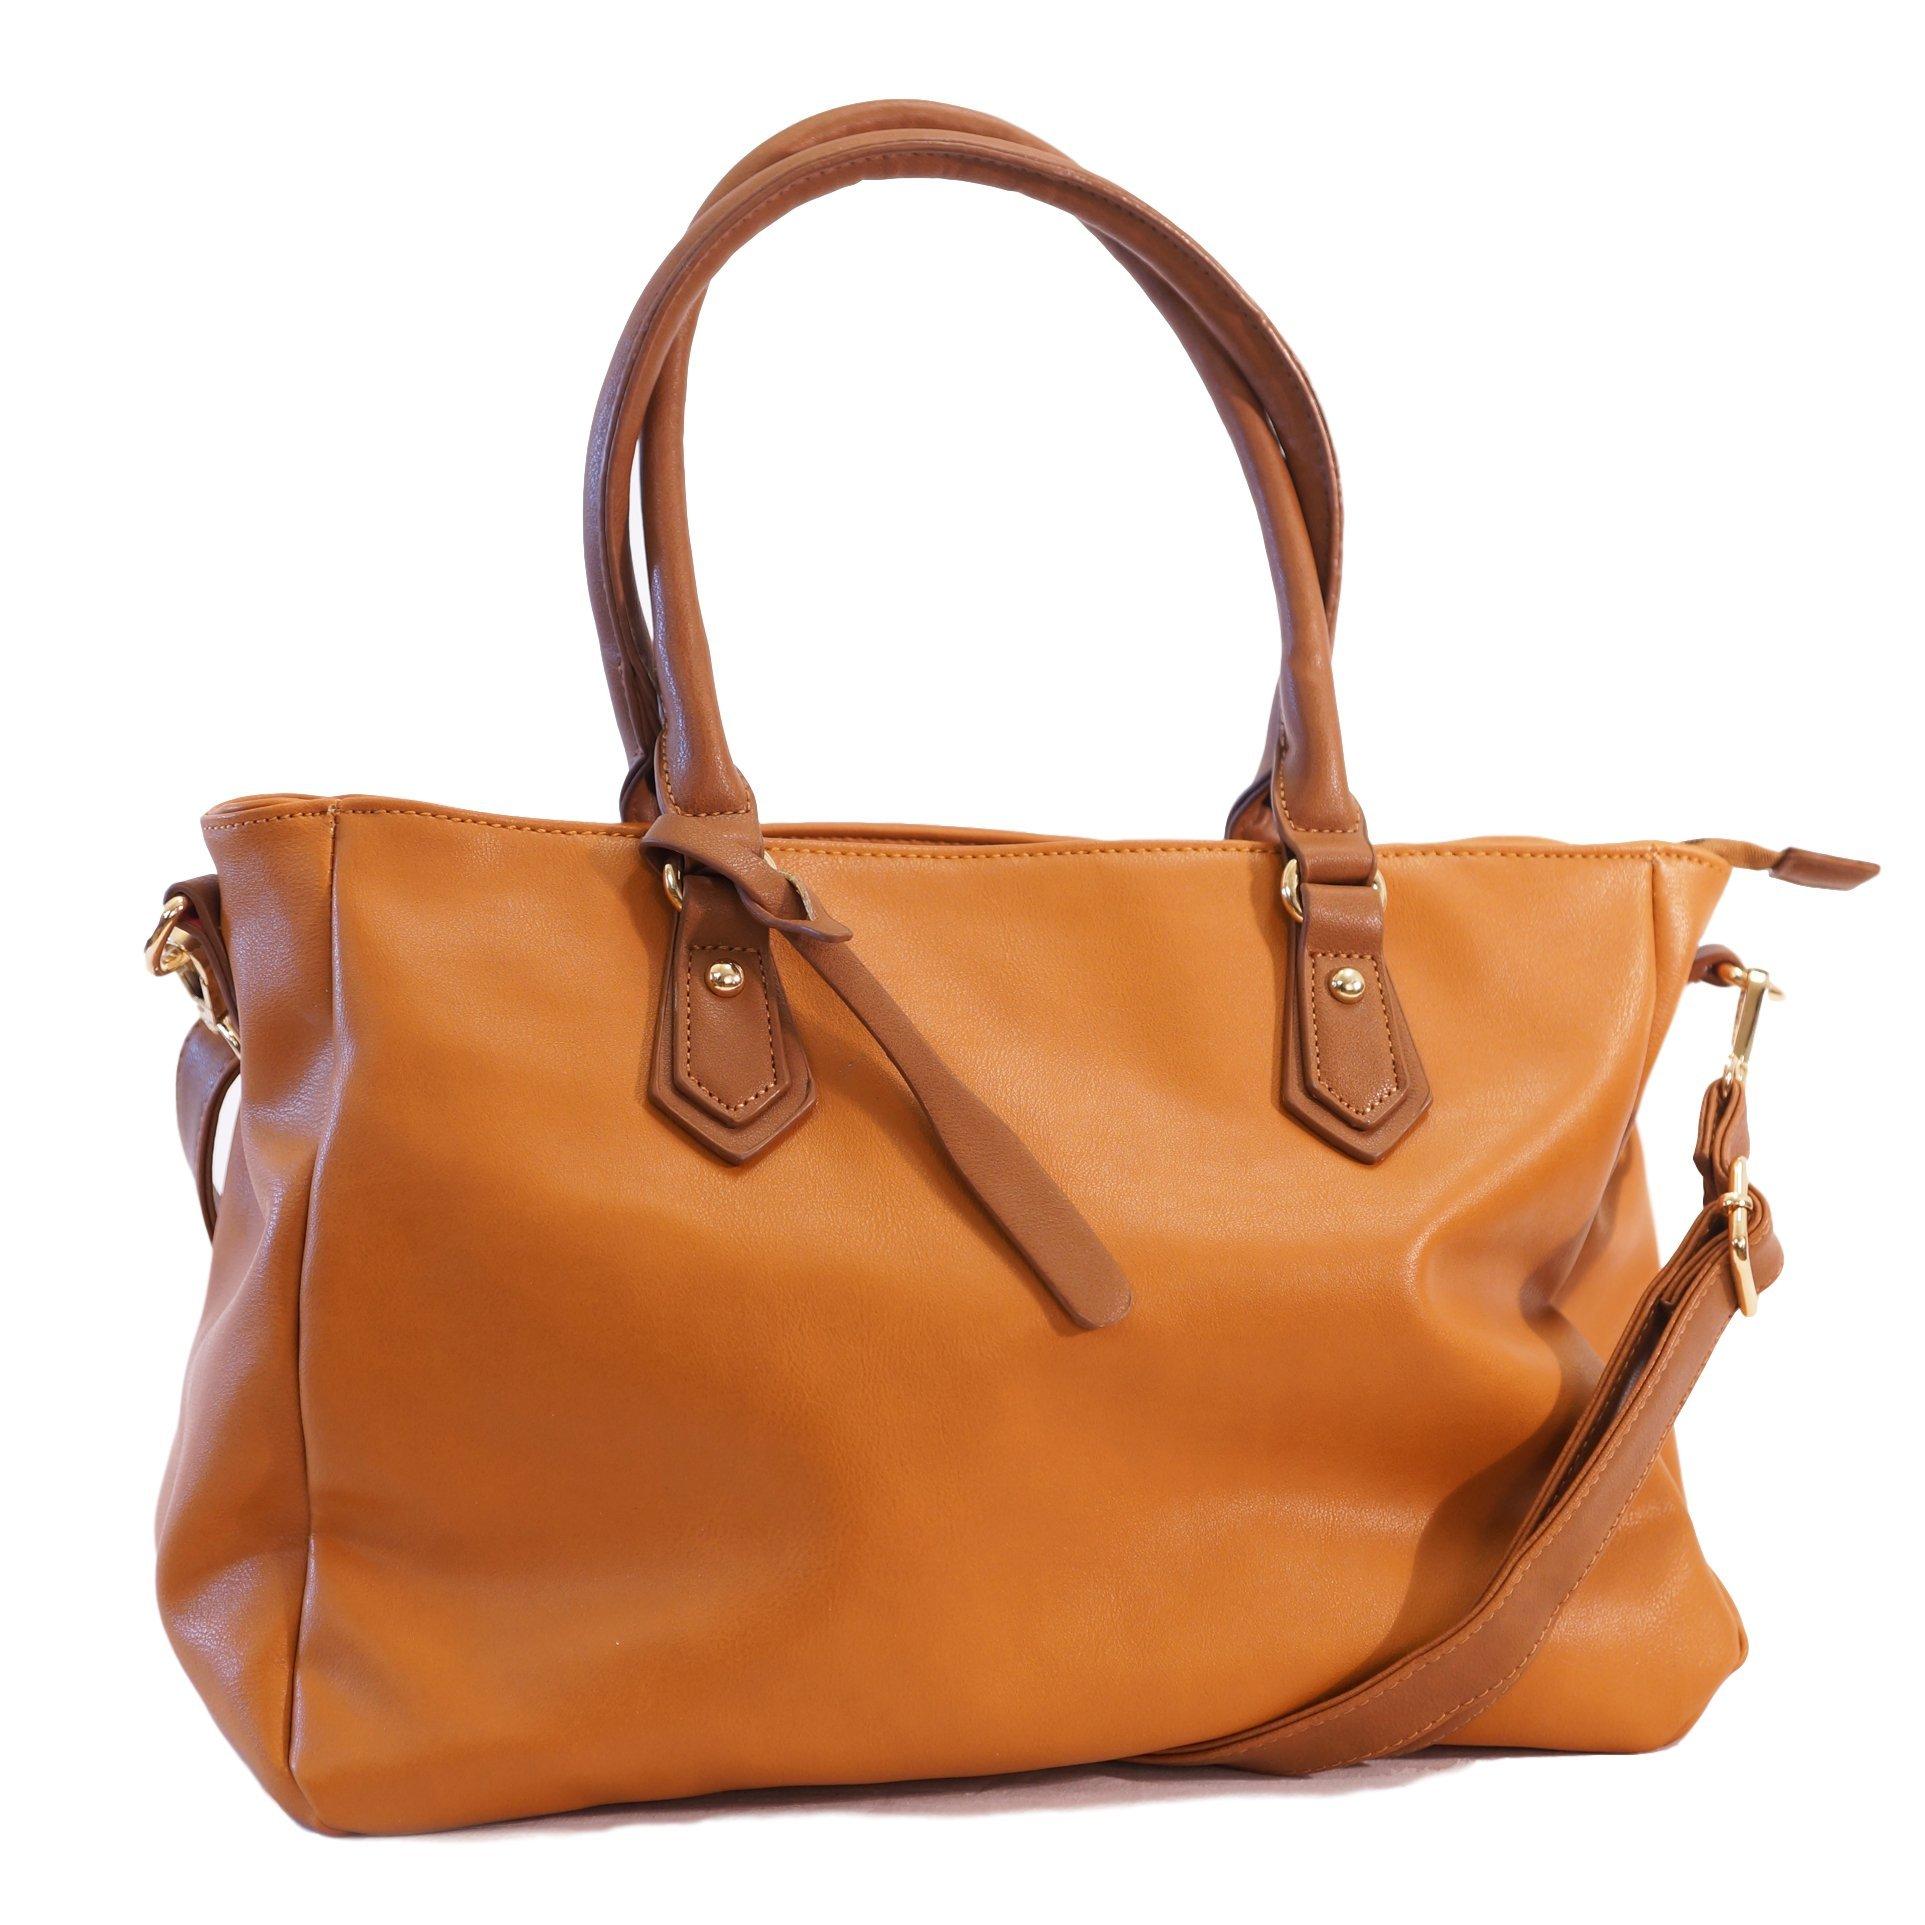 Got Oil Supplies Essential Oils Hobo Bag for Women - Brown Designer Handbag Purse with 16 Elastic Pockets